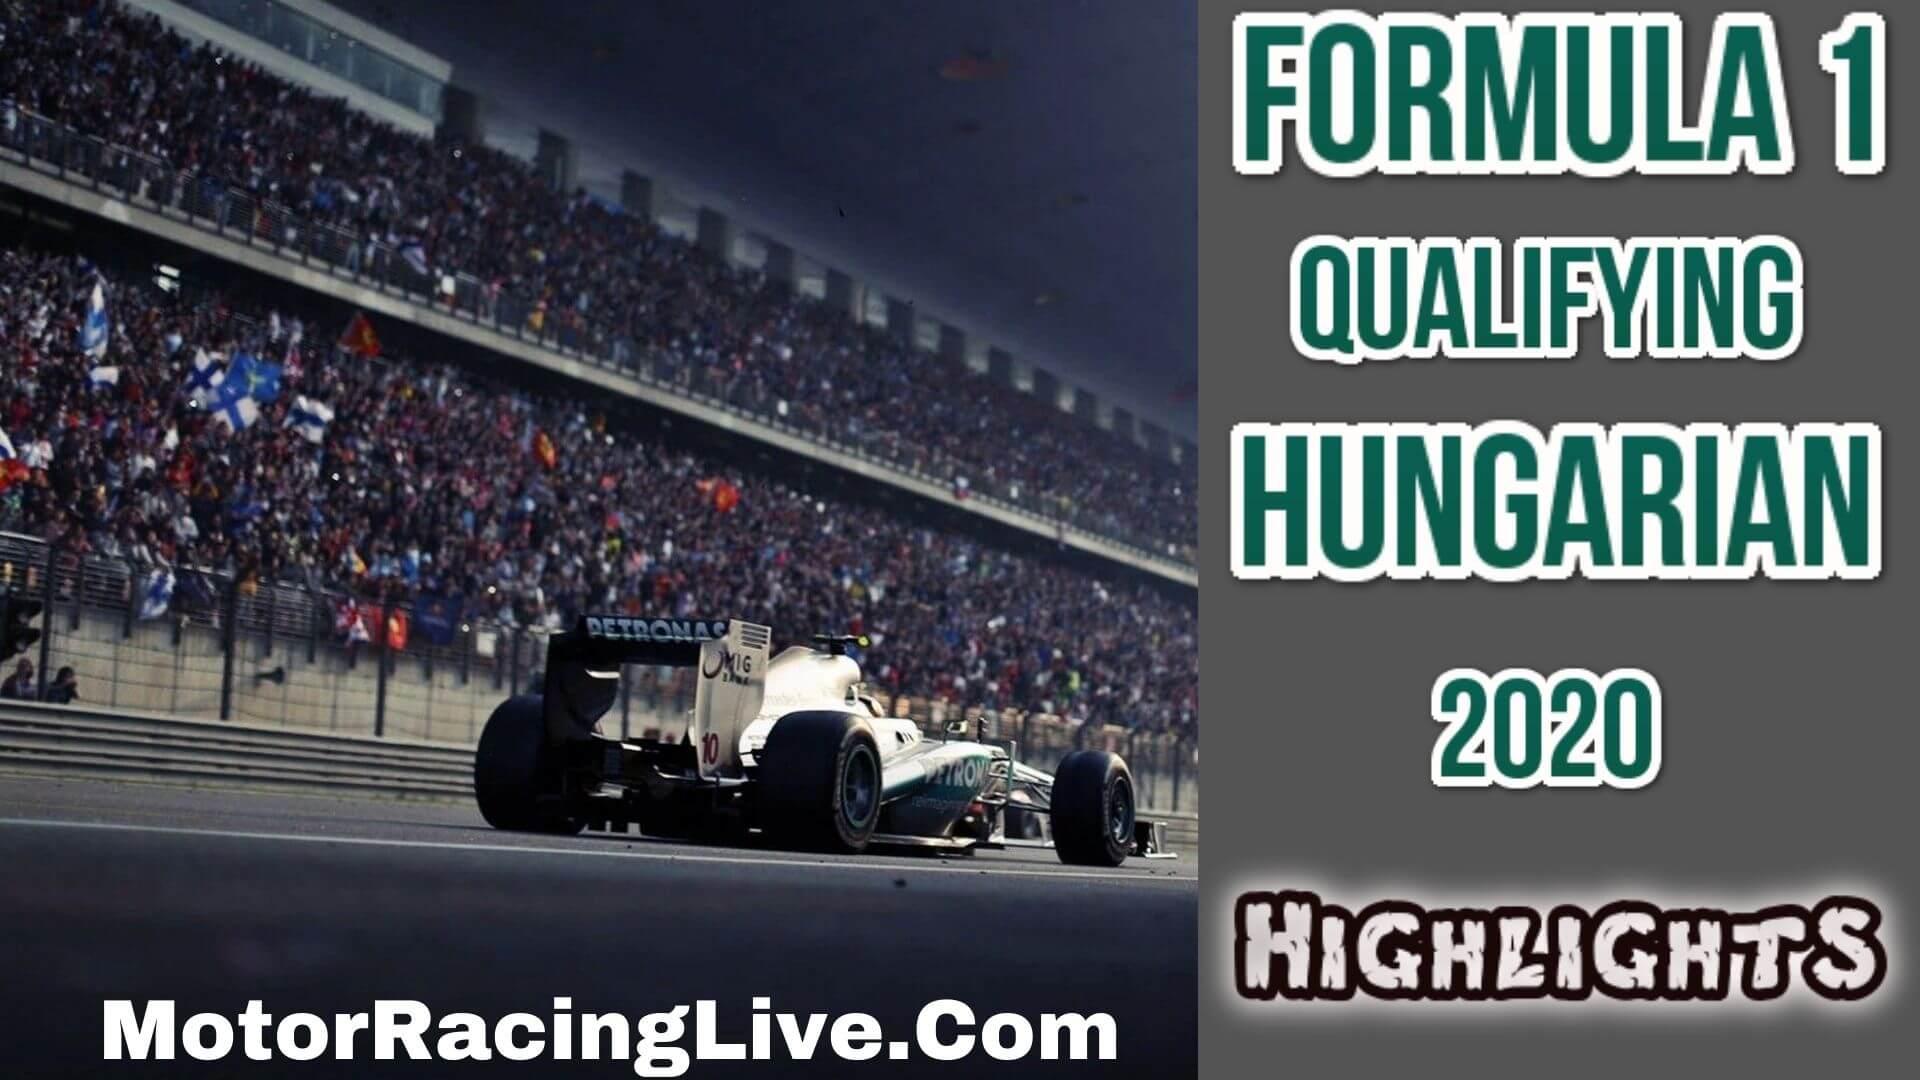 F1 Qualifying Hungarian Gp Race 2020 Highlights